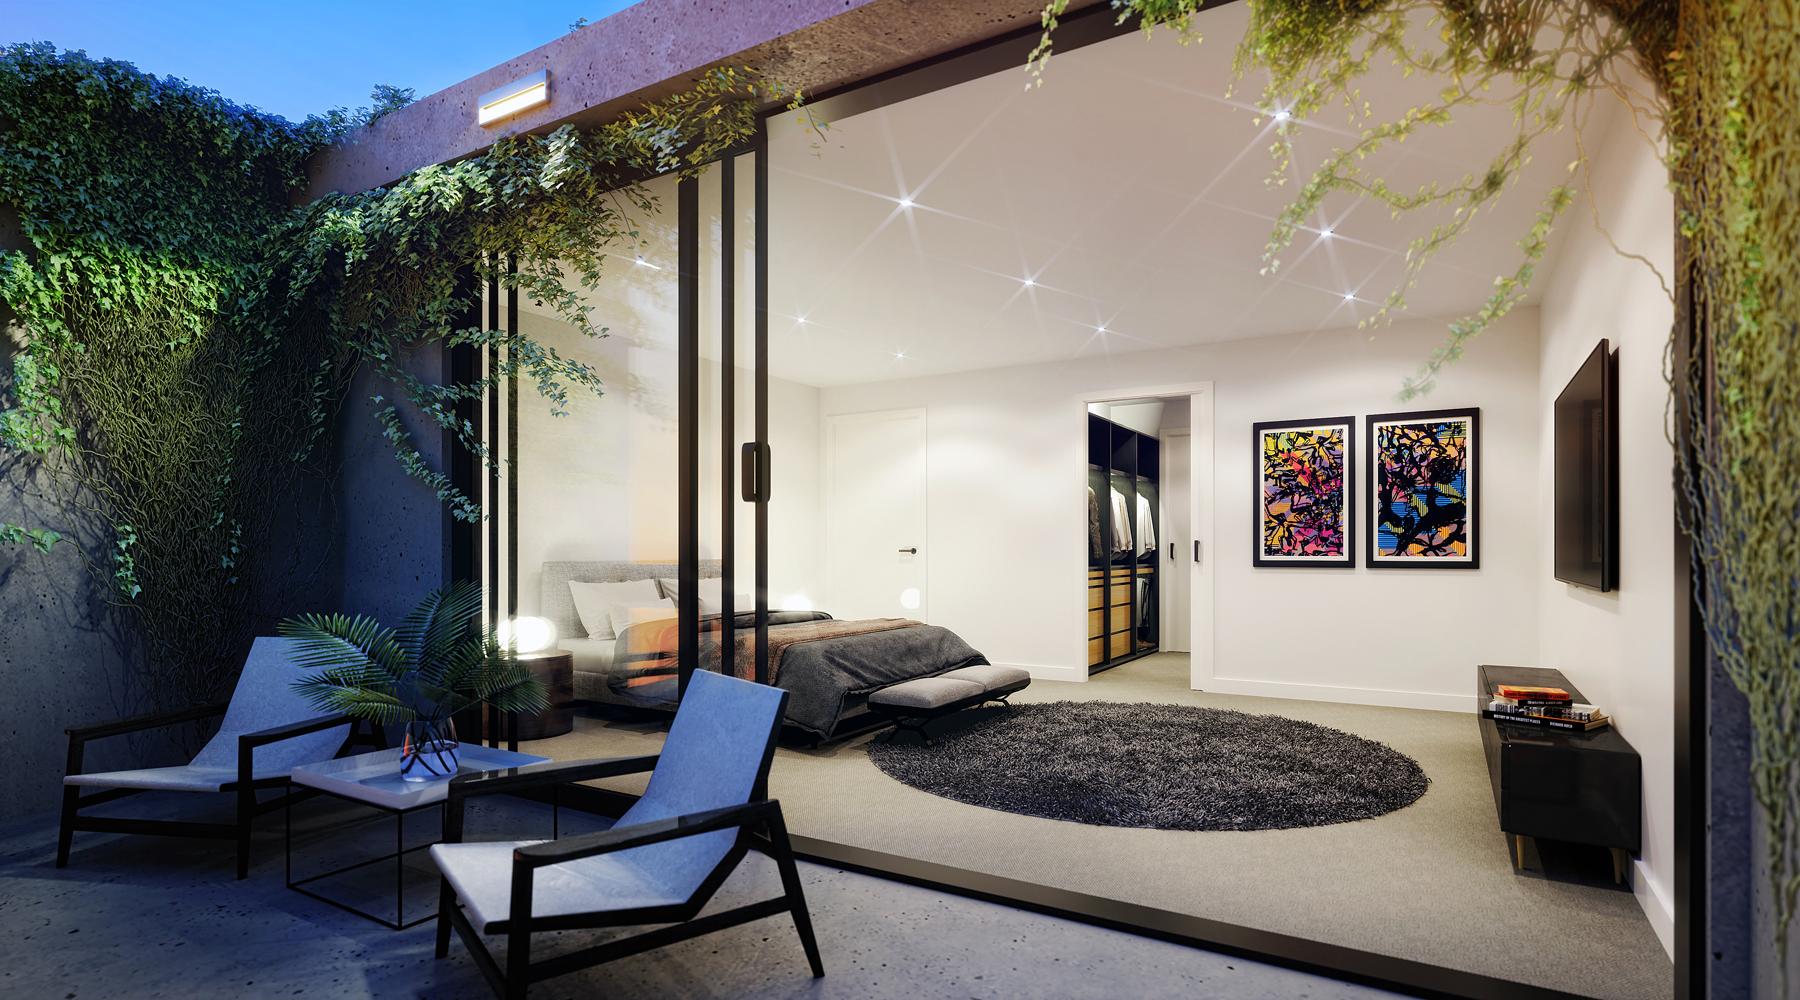 ELWOOD-Interior-Bedroom_medium